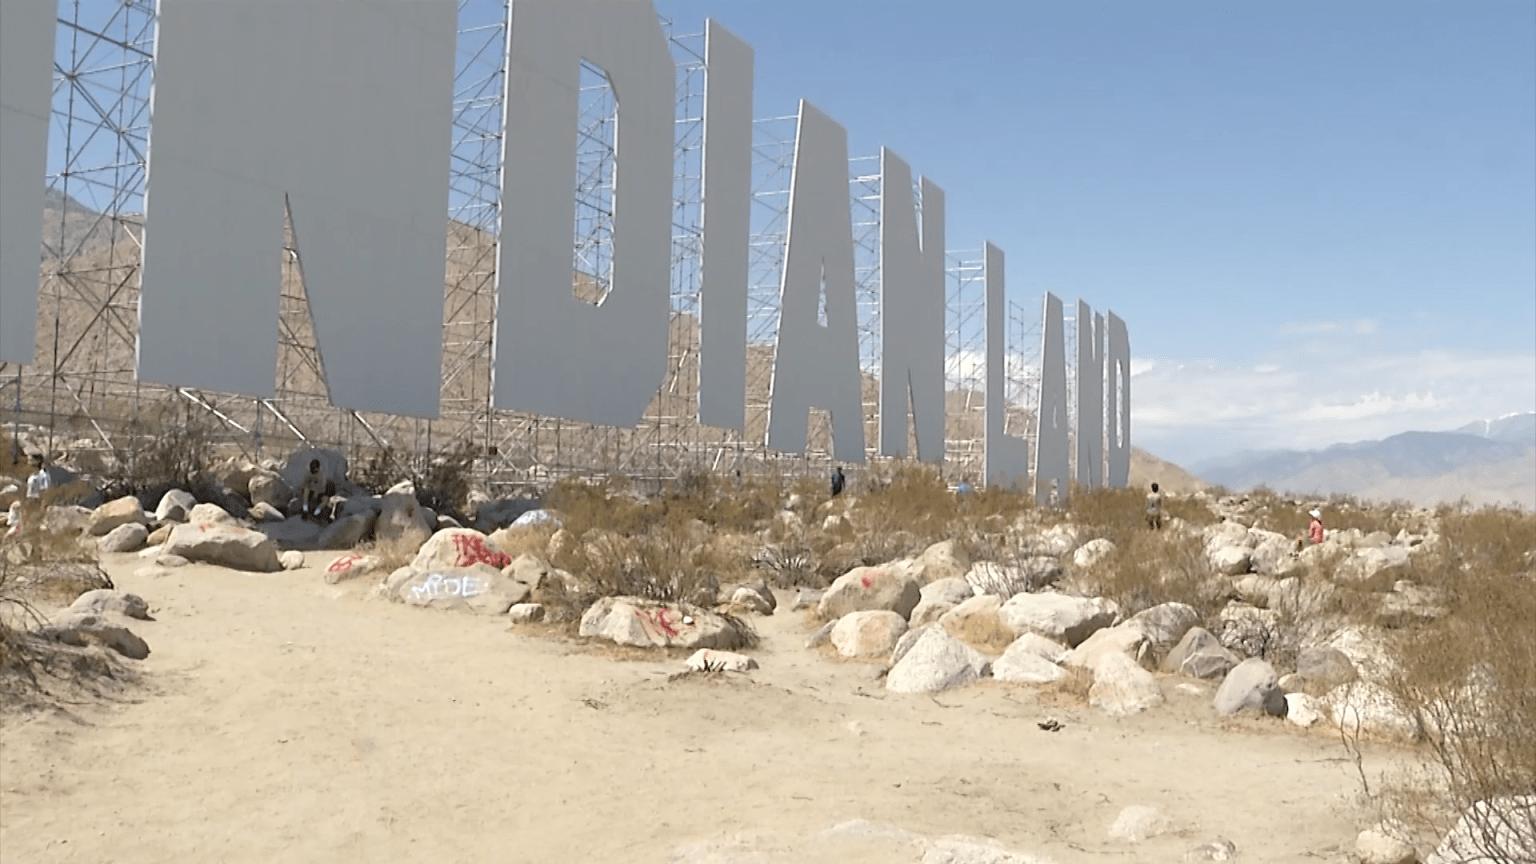 Vandals tag path to Desert X exhibit